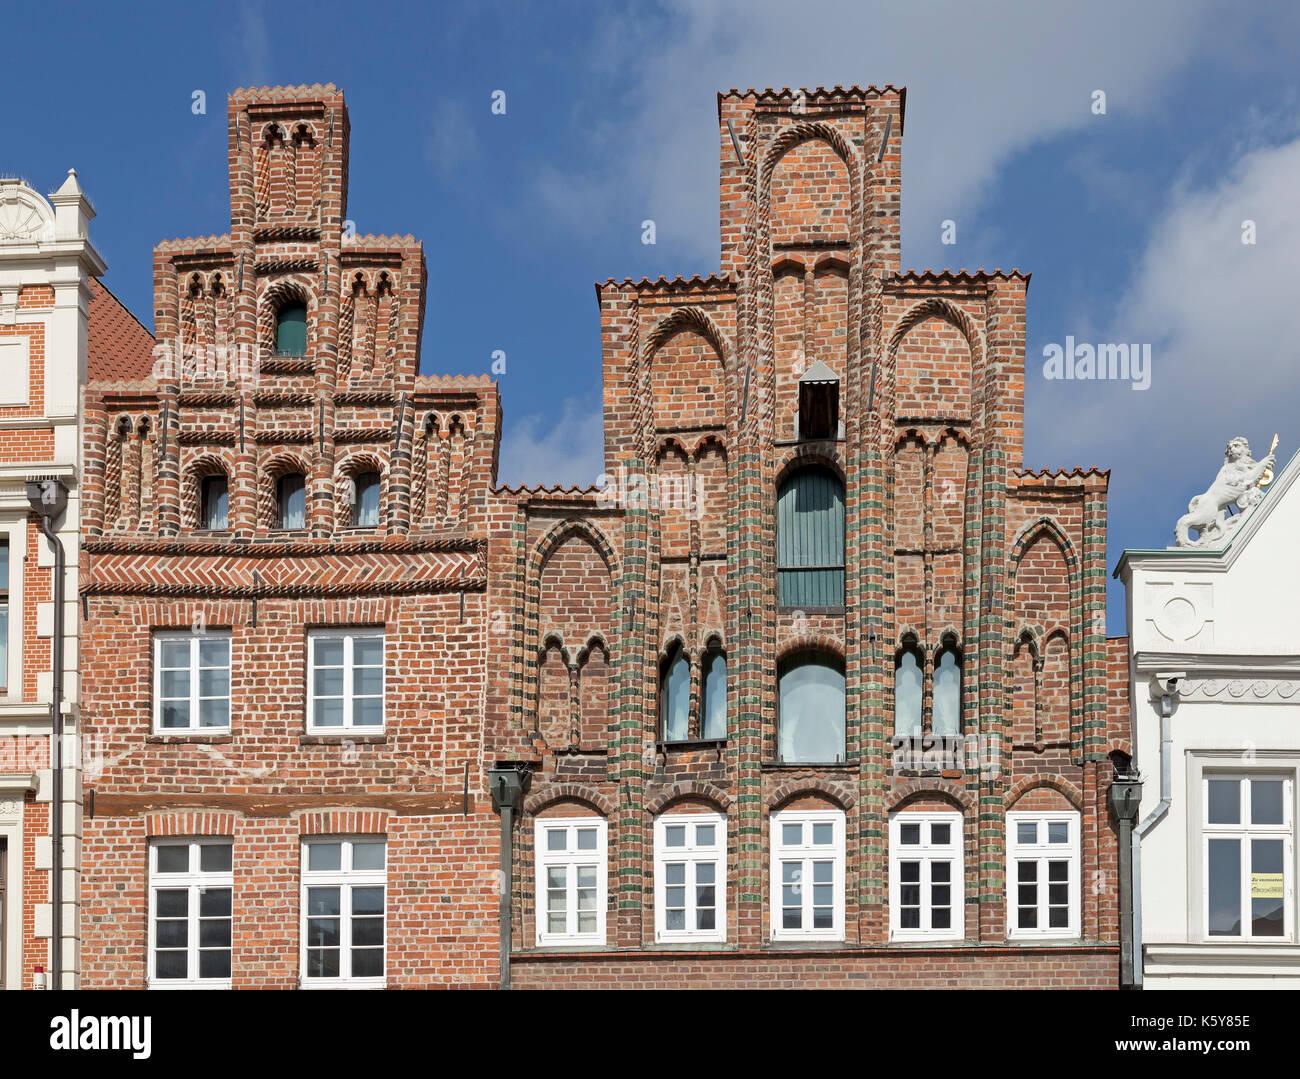 gables, Am Sande, Lueneburg, Lower Saxony, Germany - Stock Image